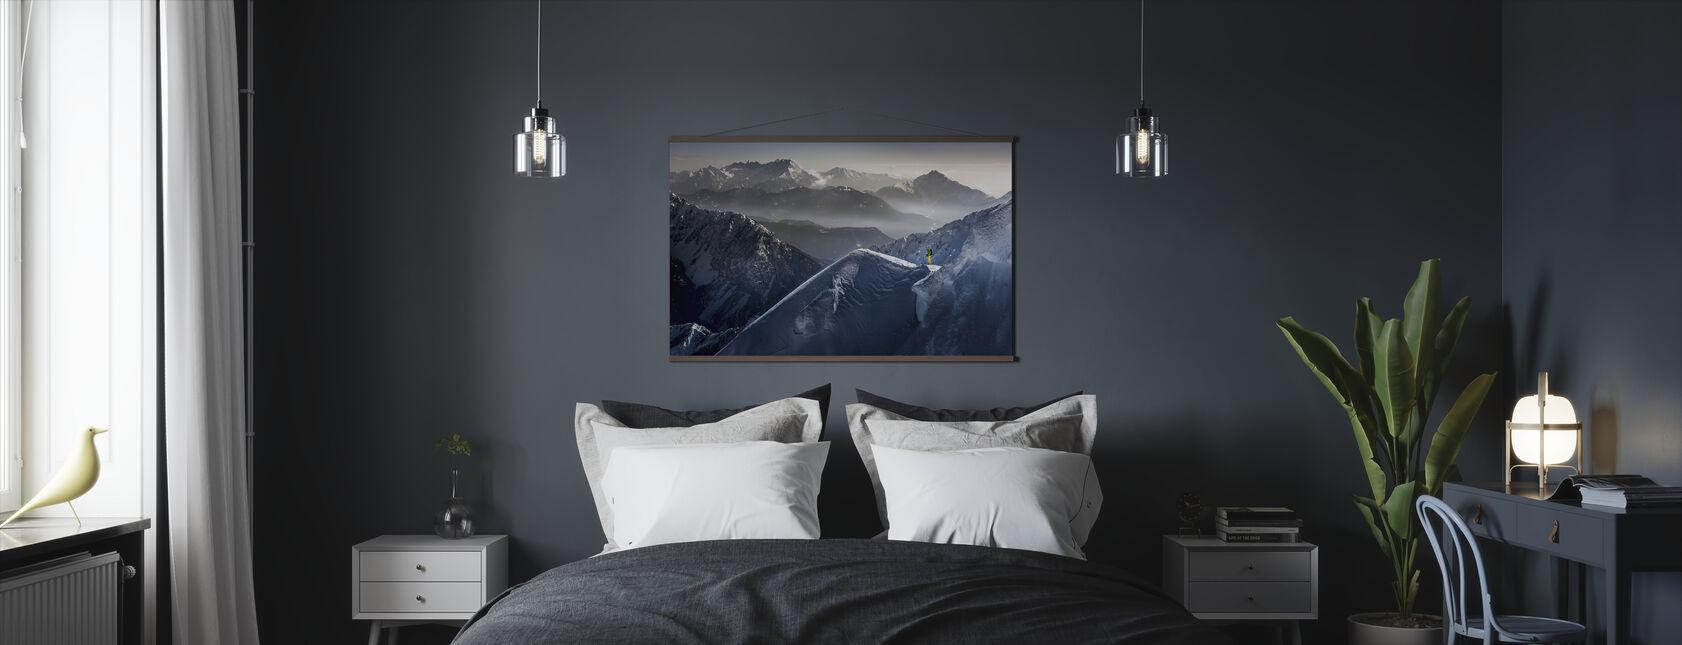 Skiløber på Mountain Top - Plakat - Soveværelse